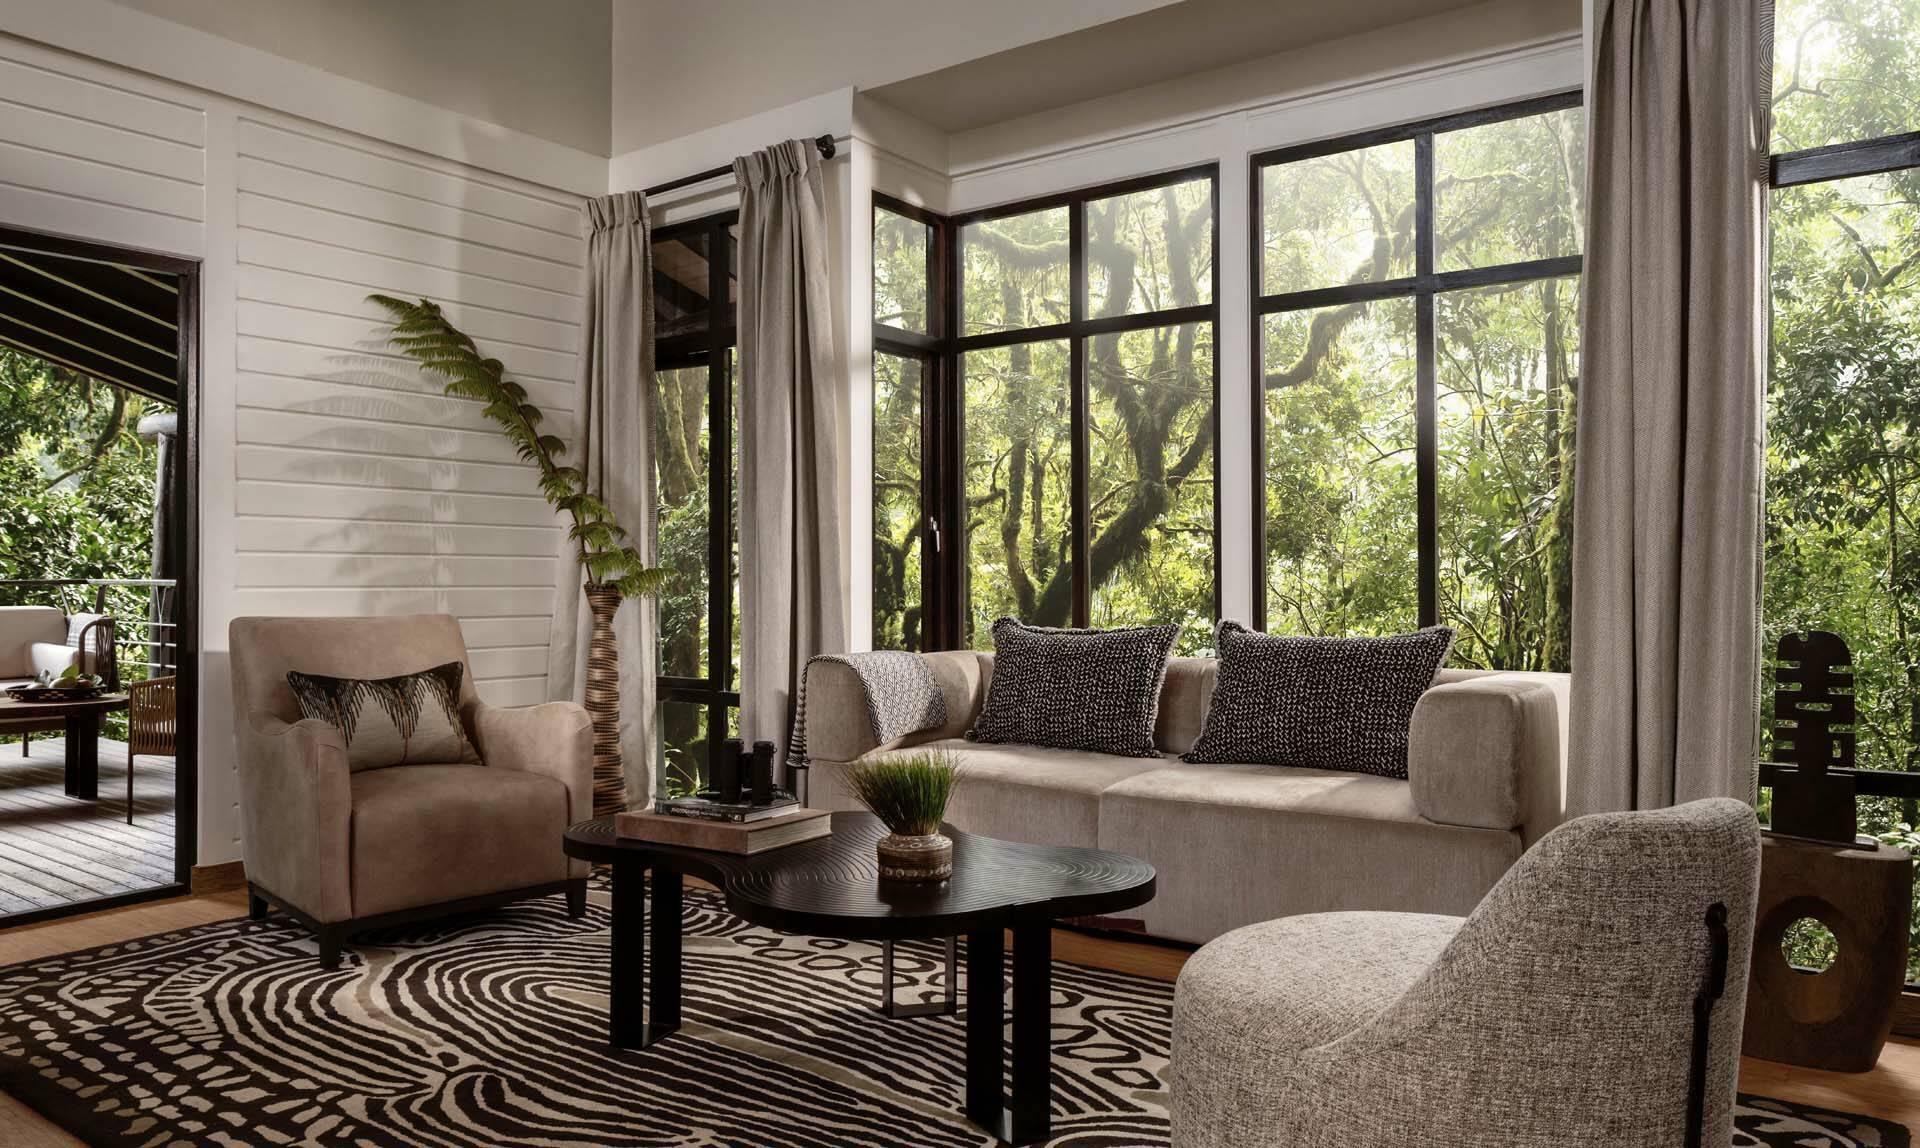 Rwanda OneandOnly NyungweHouse Suite